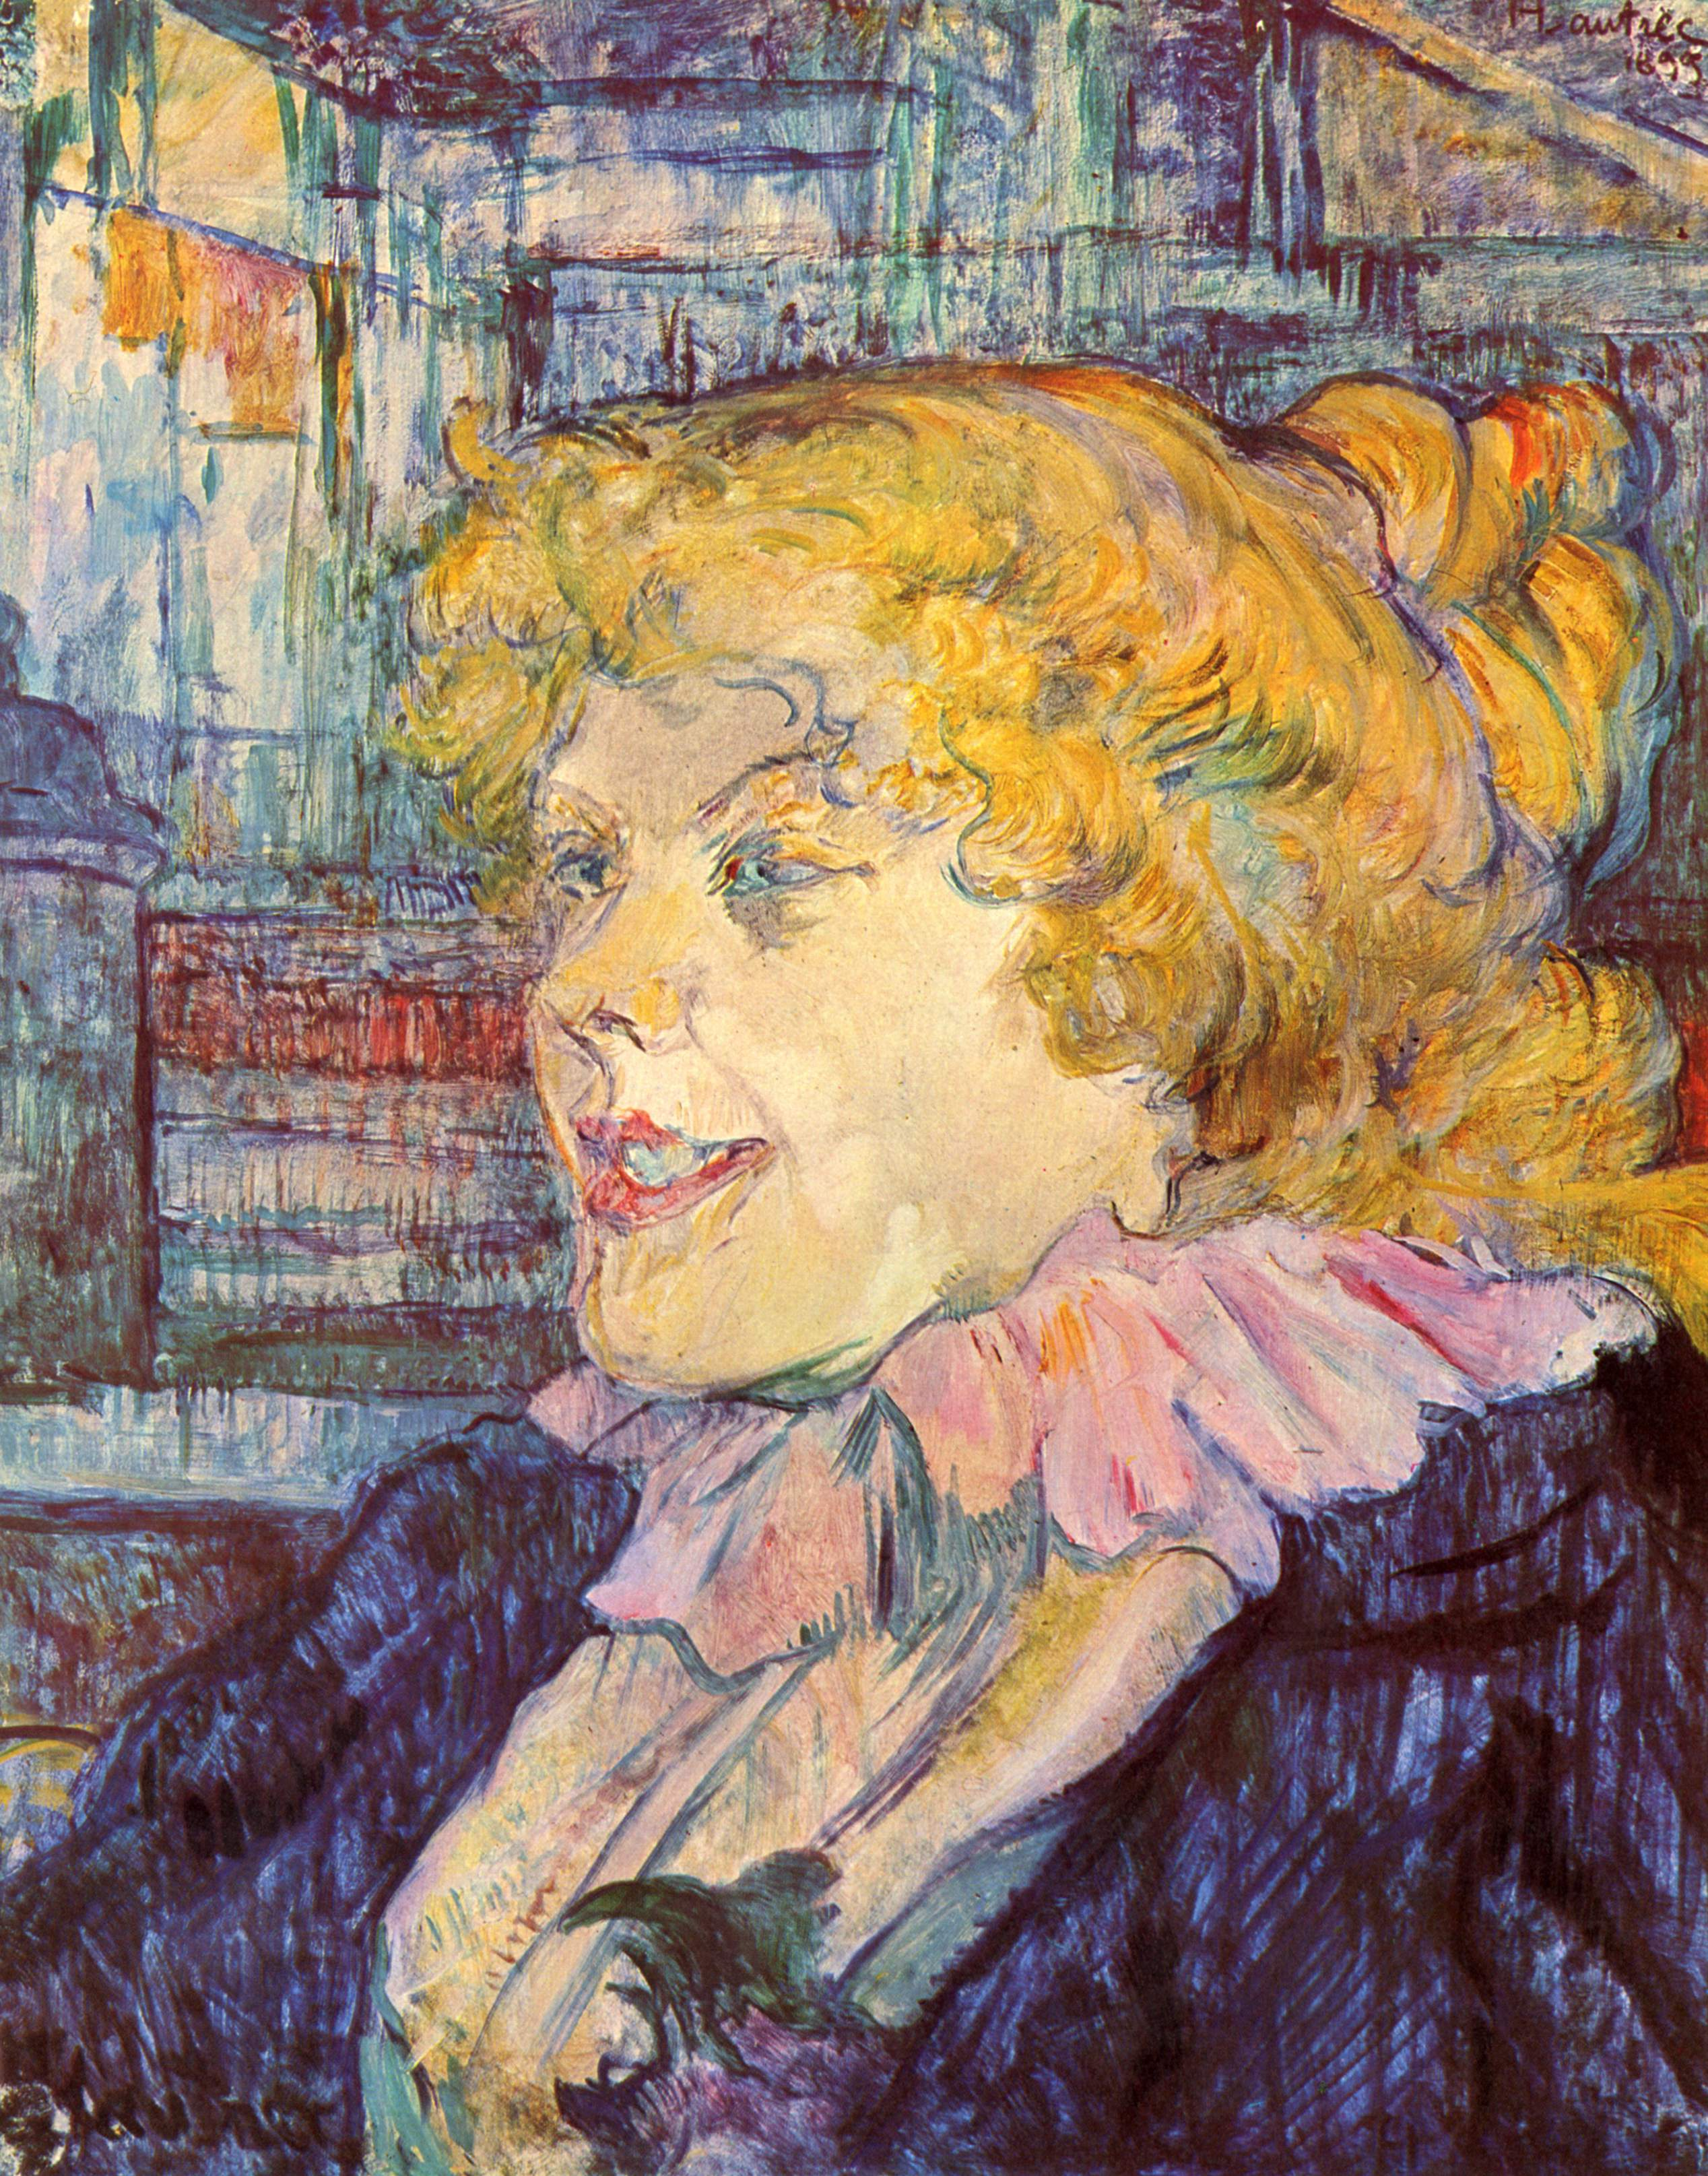 File:Henri de Toulouse-Lautrec 053.jpg - Wikimedia Commons